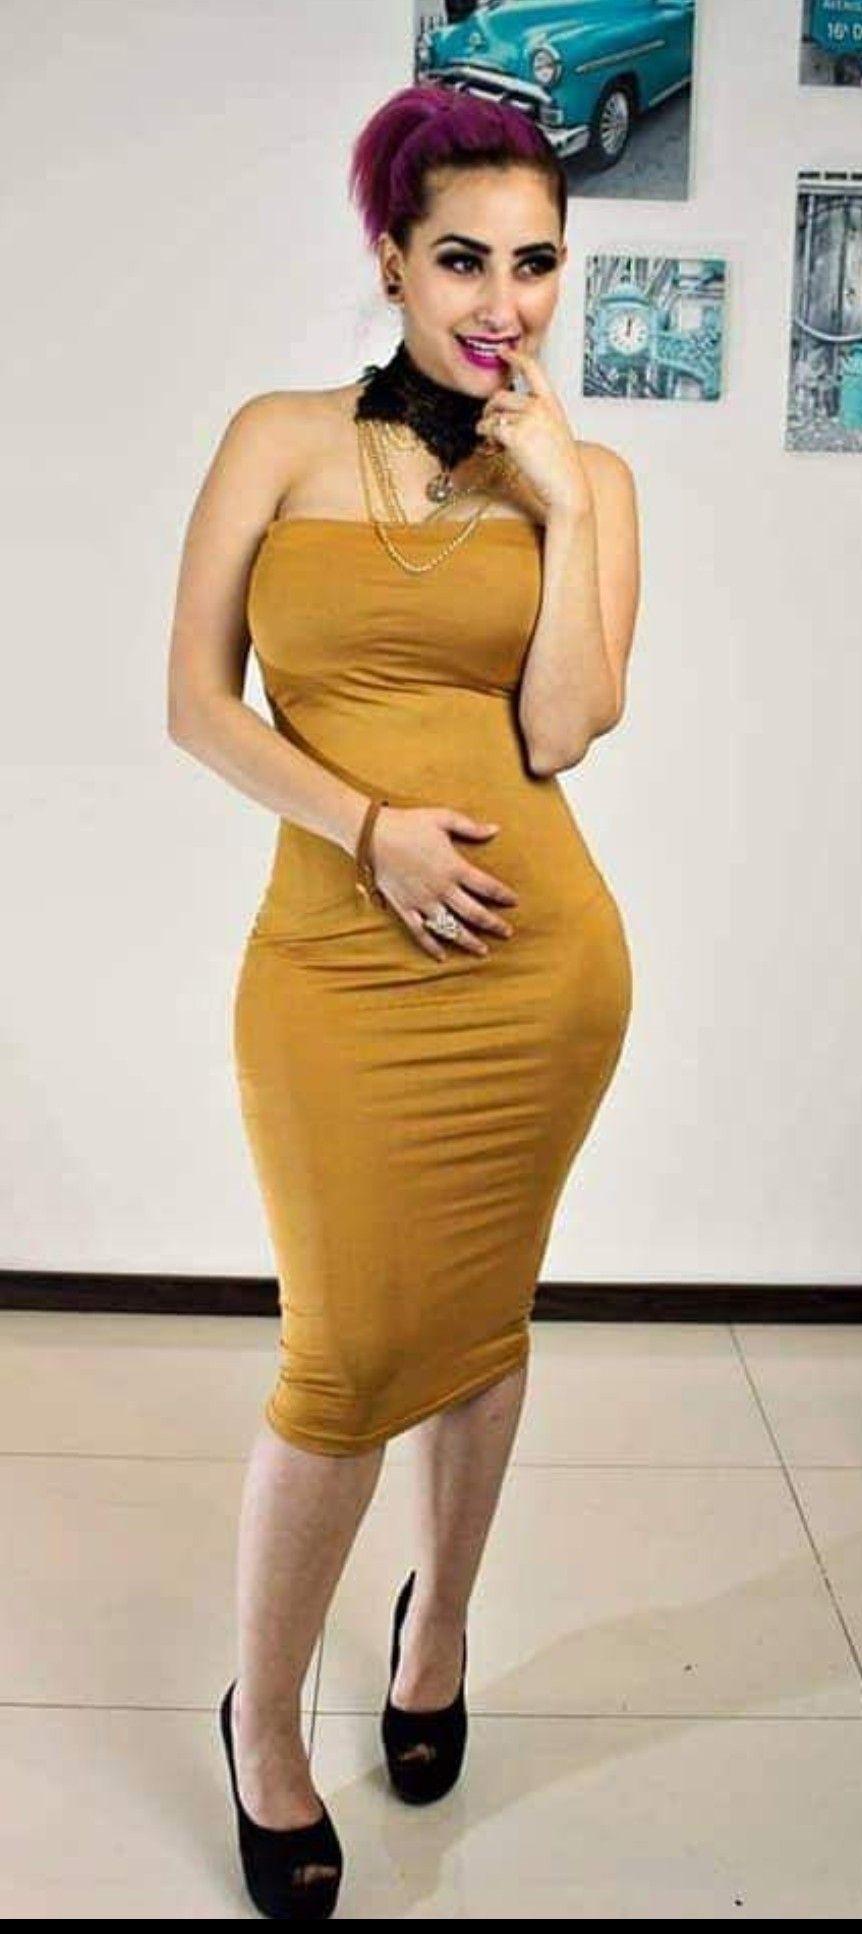 Curvy bodycon dress as seen on tv